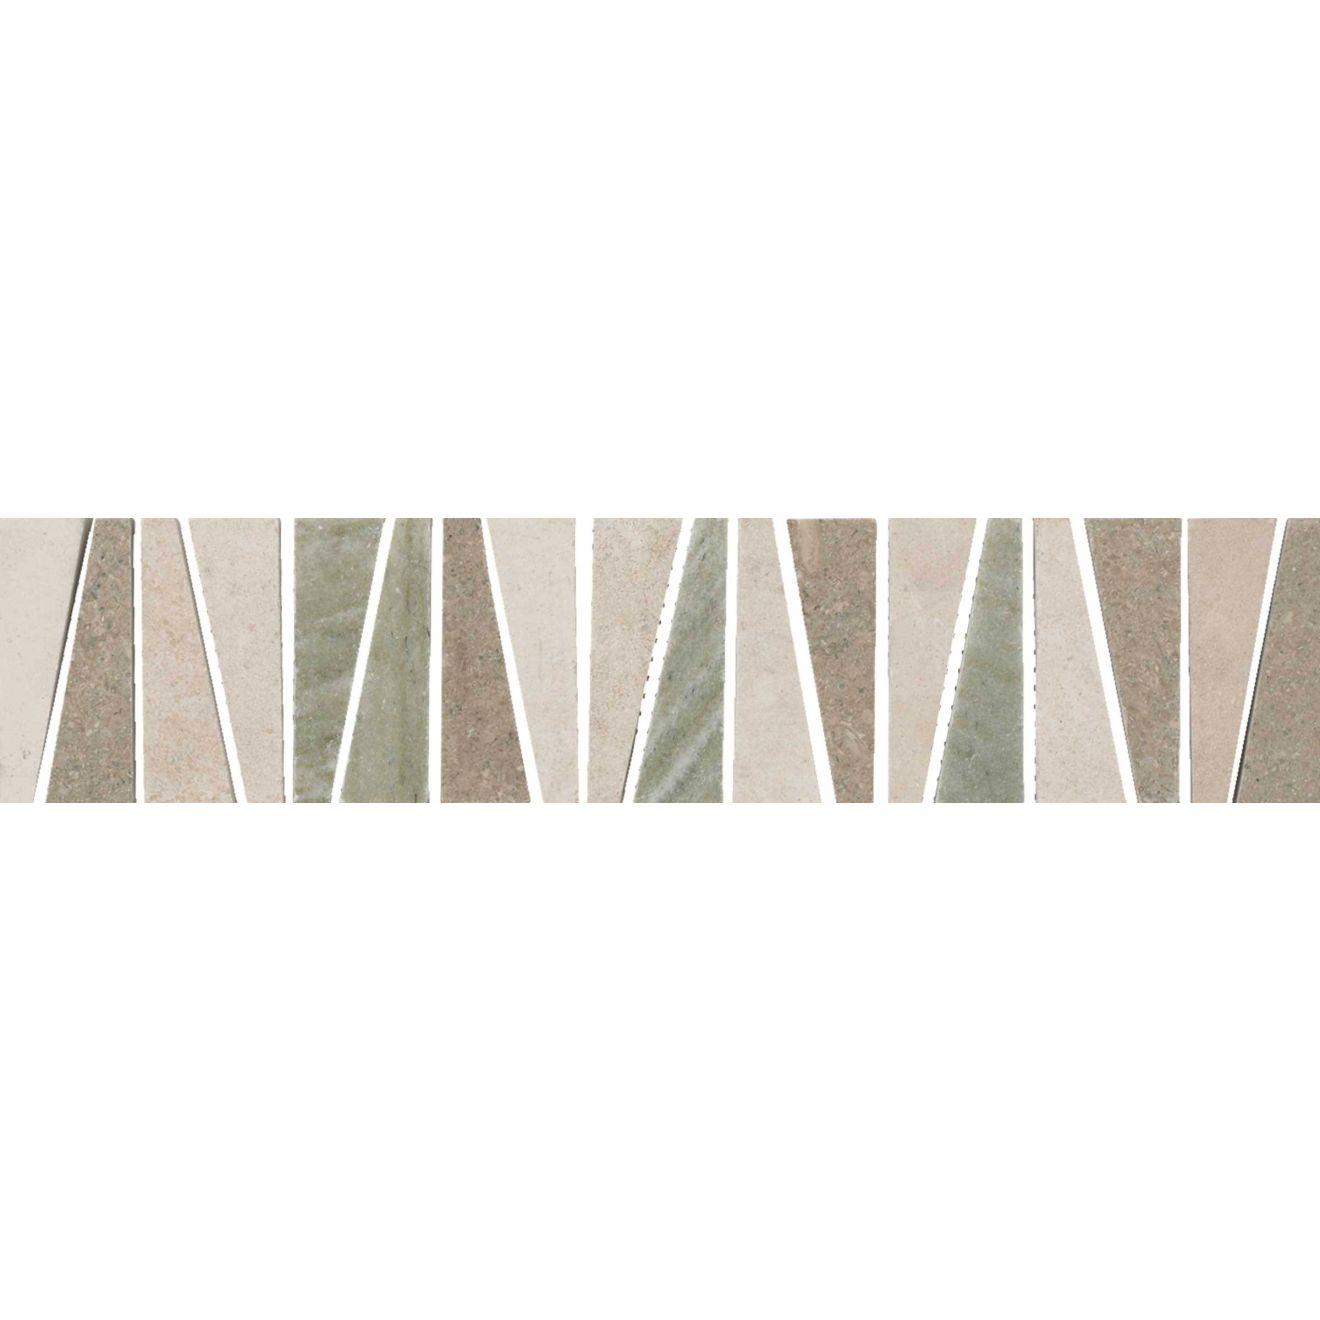 "Menage et Trois 2.5"" x 12"" Floor & Wall Listello in Crema, Tepenade, Verde Laguna"